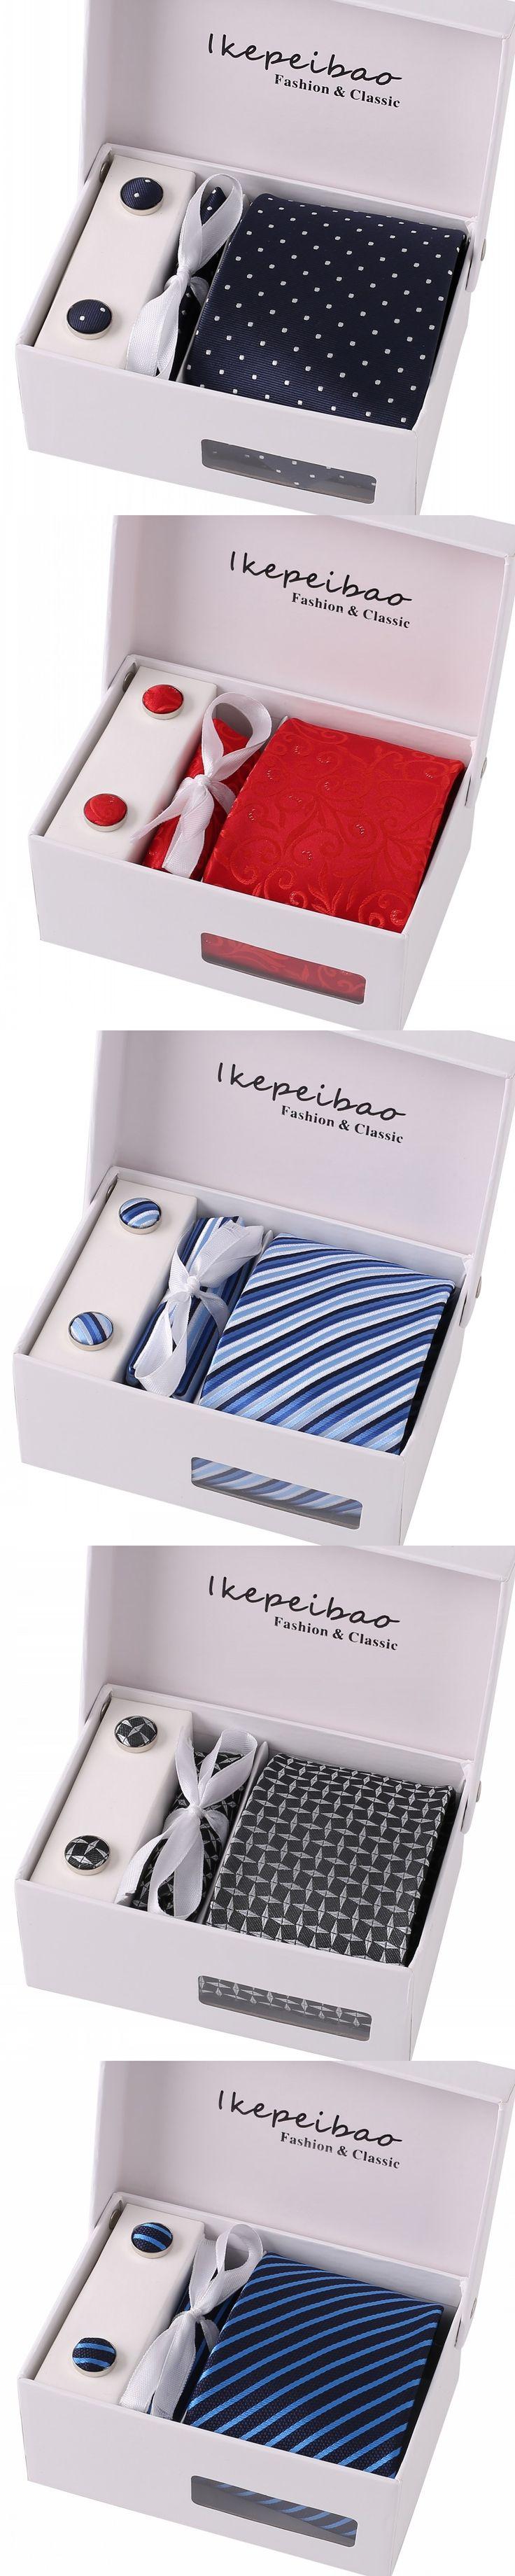 Men Ties Gray Black Star Necktie Sets Cufflink Hanky Neckwear Corbatas Gravata Hombre Jacquard Woven  Business Wedding Holiday